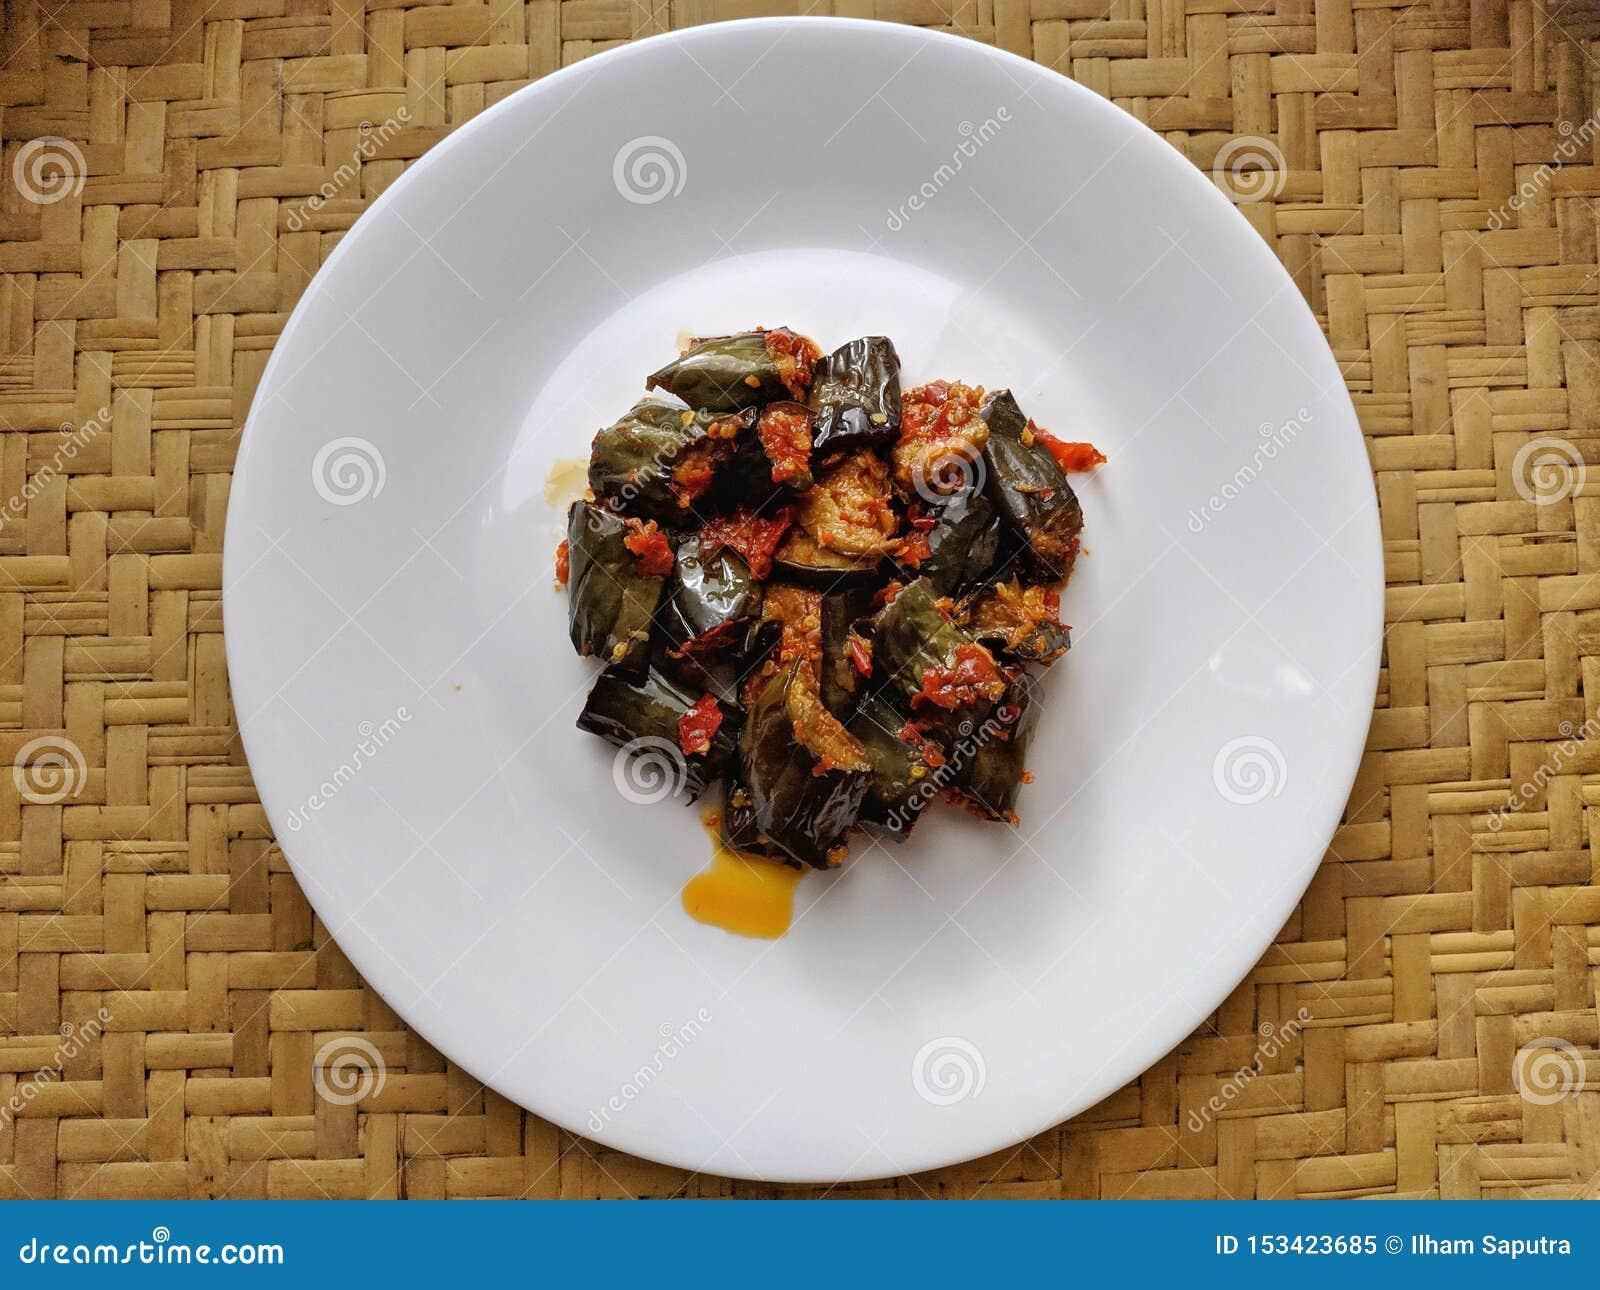 Sambal Terong is Indonesian traditional food